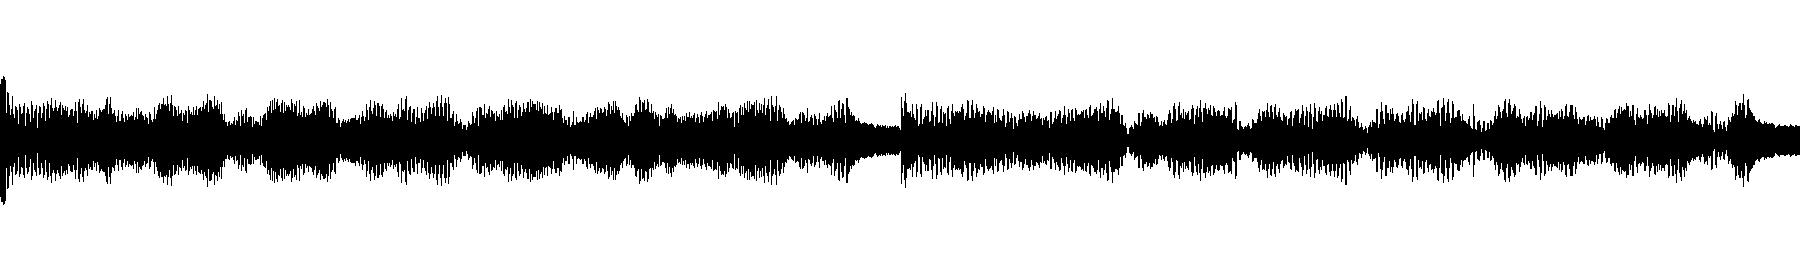 pth synth 20